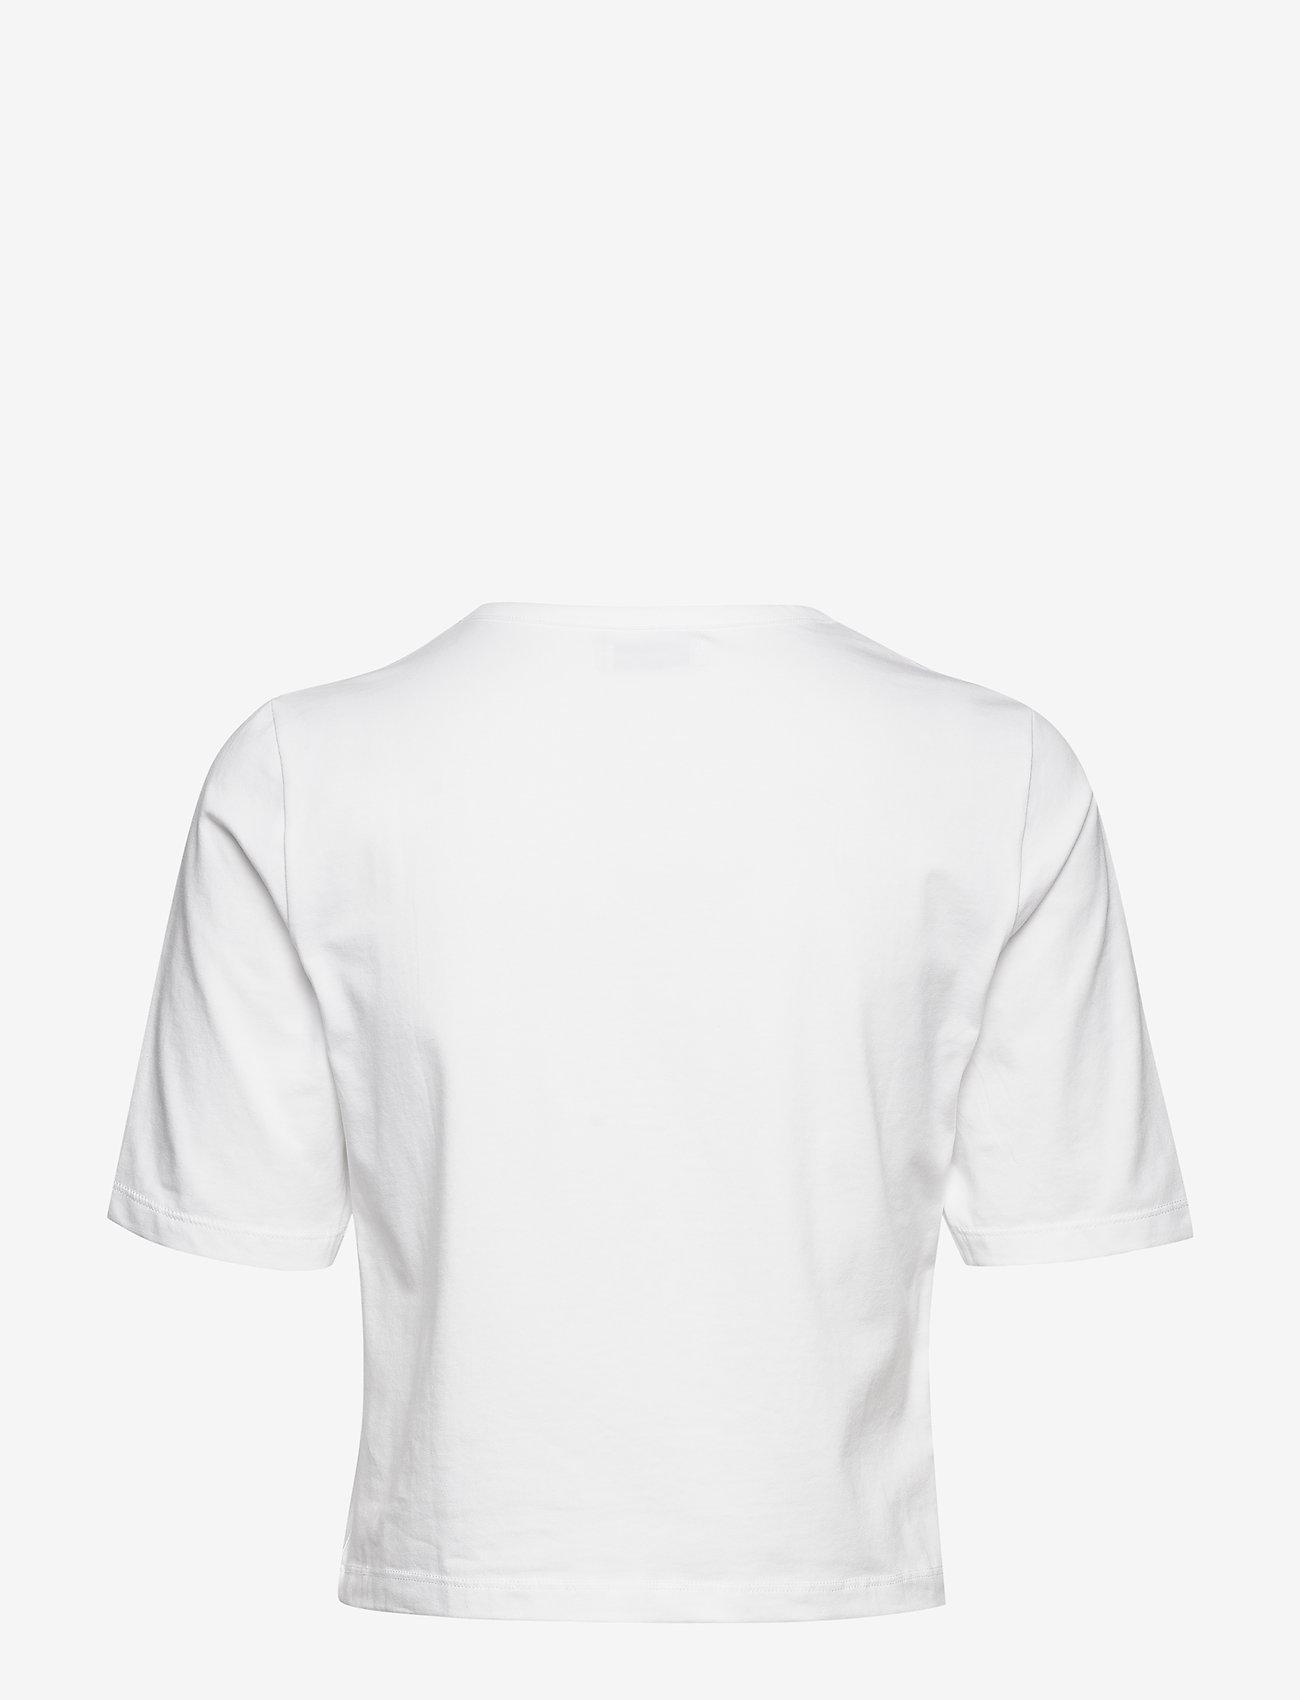 Tomorrow - Lennon button cropped tee - crop tops - white - 1